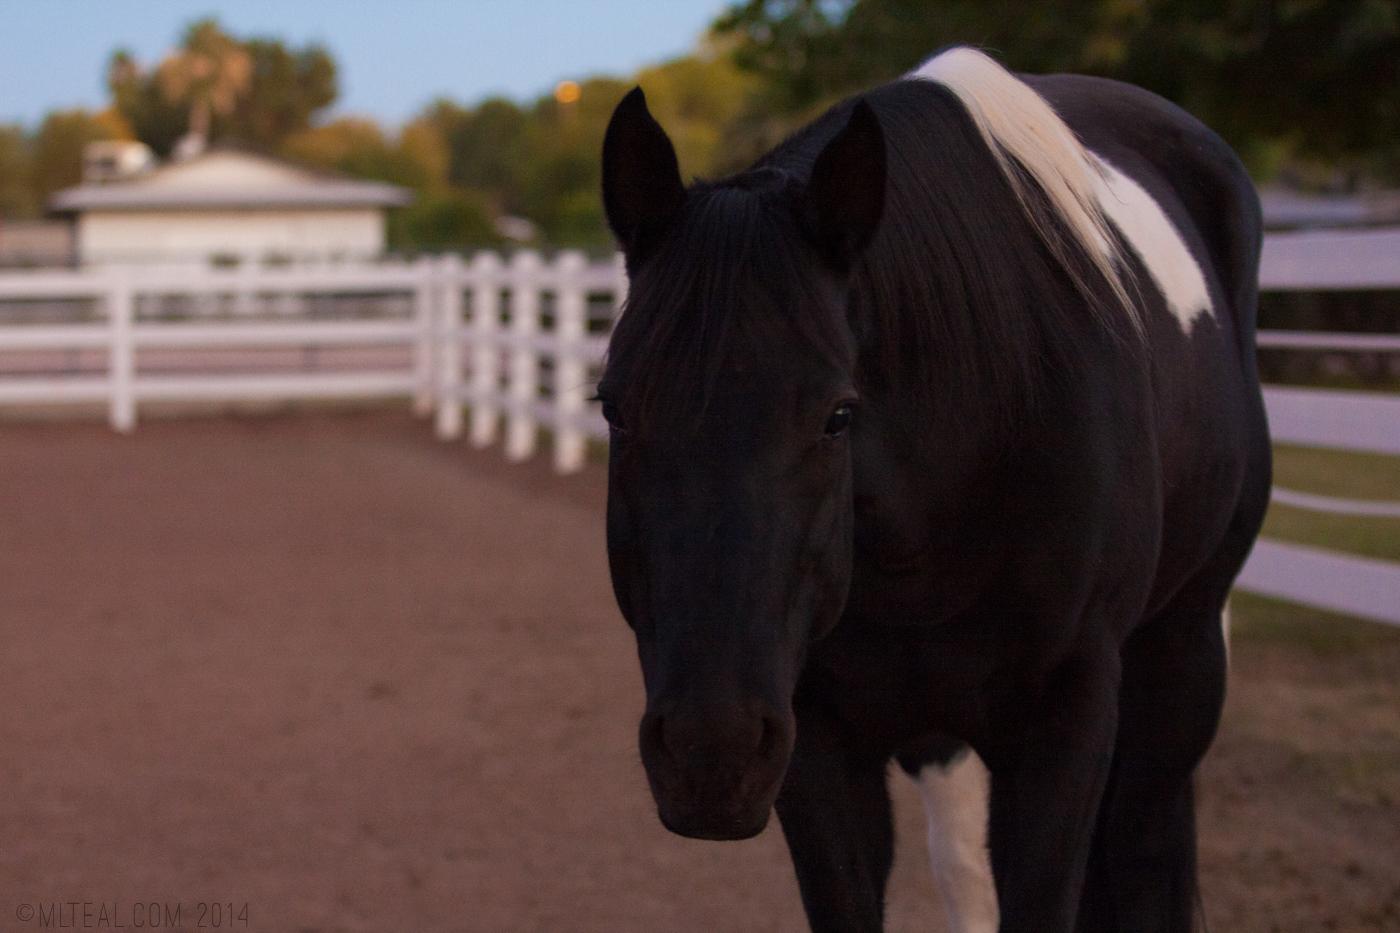 My friend Carin's horse, Sonoma